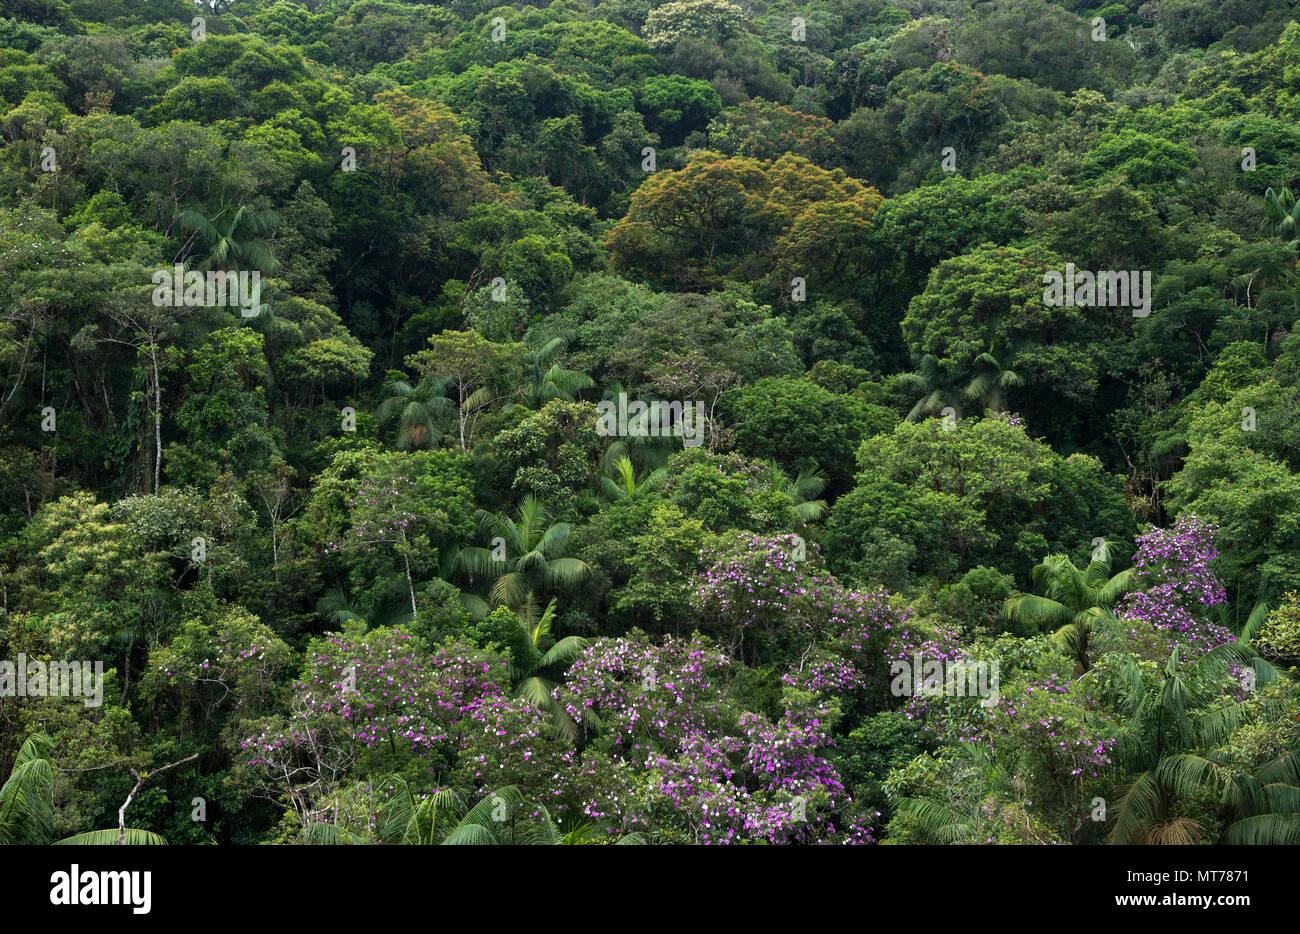 Atlantic Rainforest in São Paulo State, Brazil - Stock Image